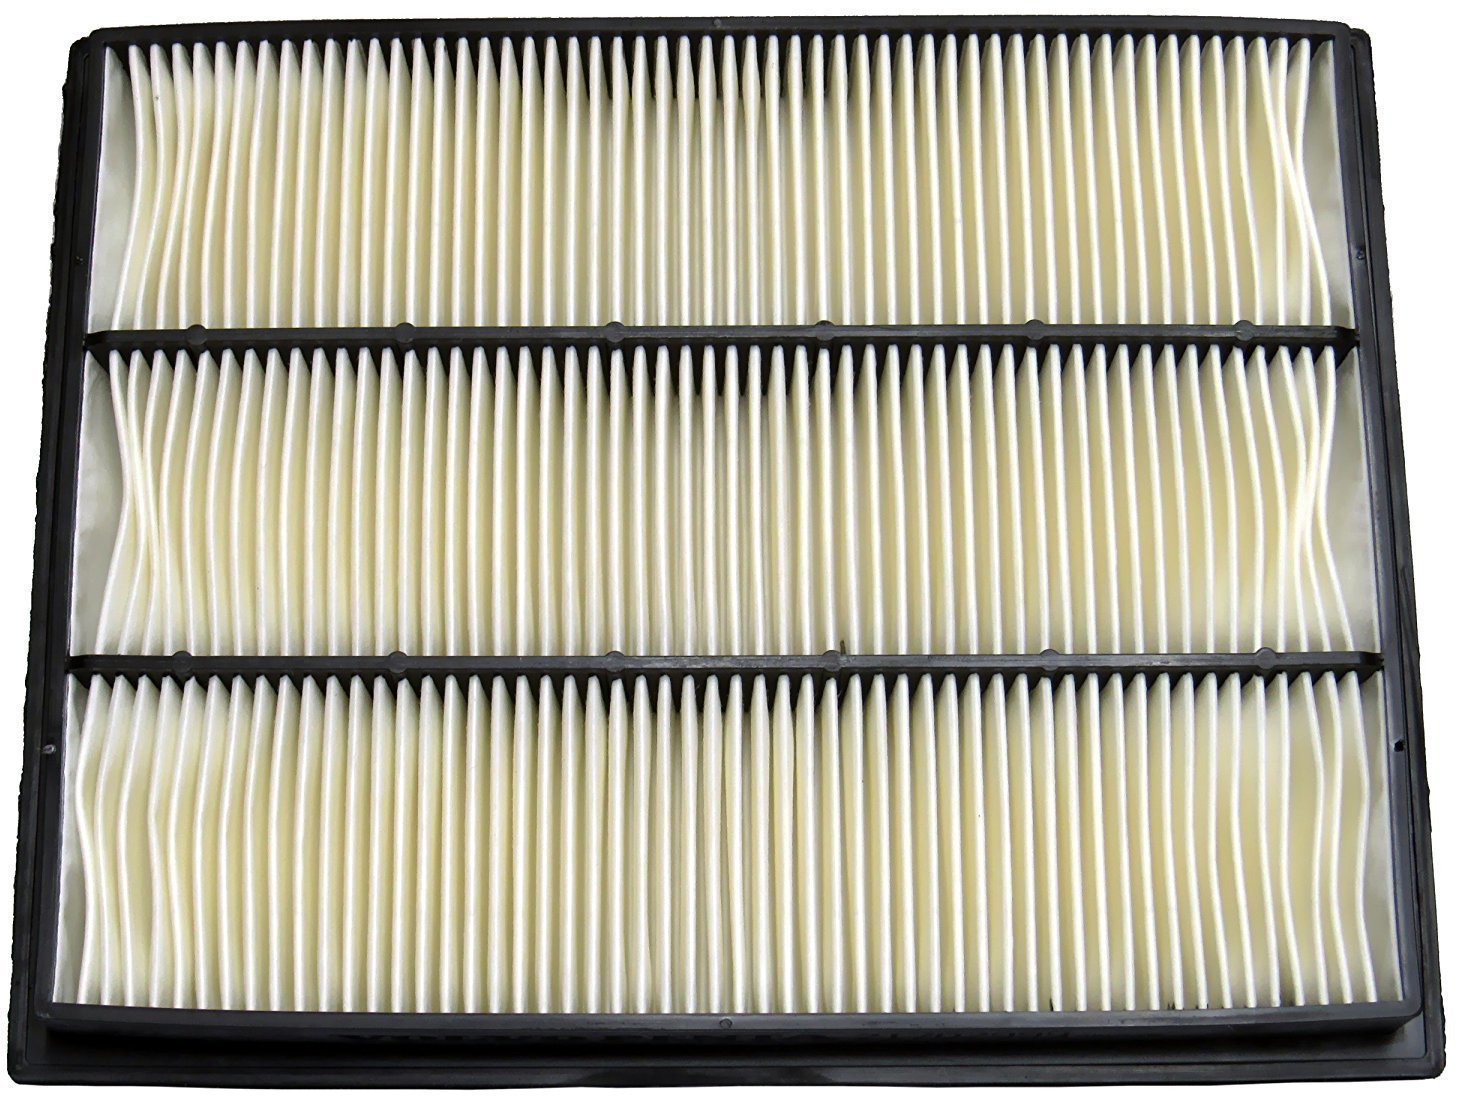 Volvo Penta Vzduchový filtr 21702999